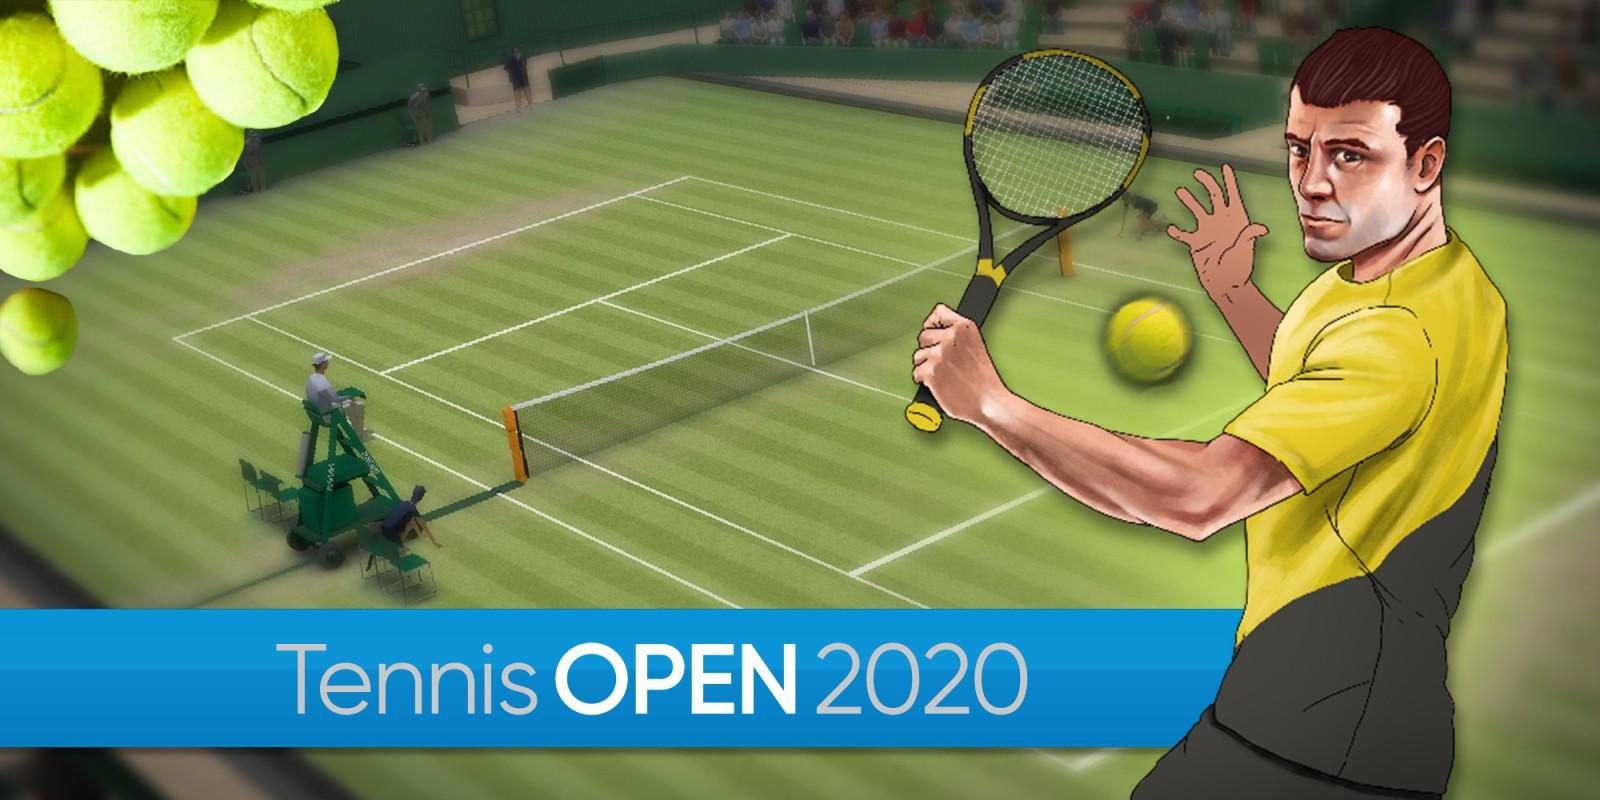 Tennis Turnierportal